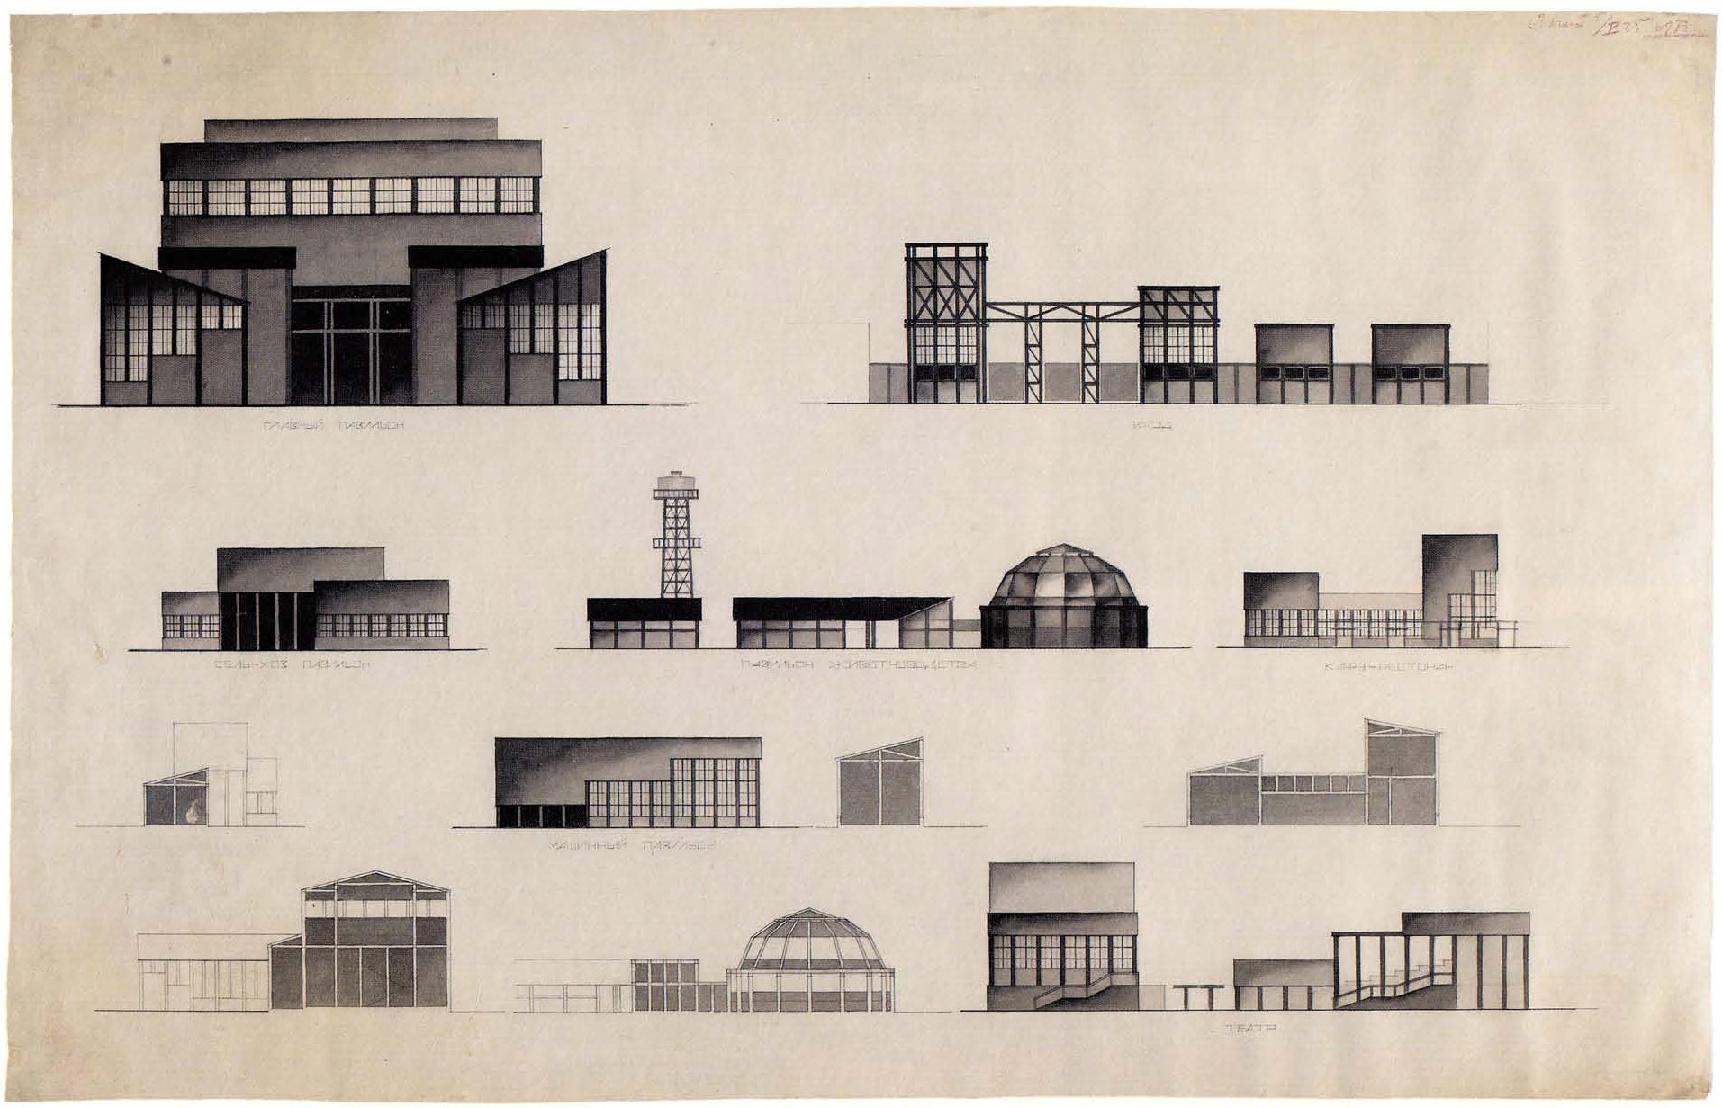 N Umanskii, A Poliakov's workshop, handicraft and industrial exhibition 3rd year 1924 Vkhutemas